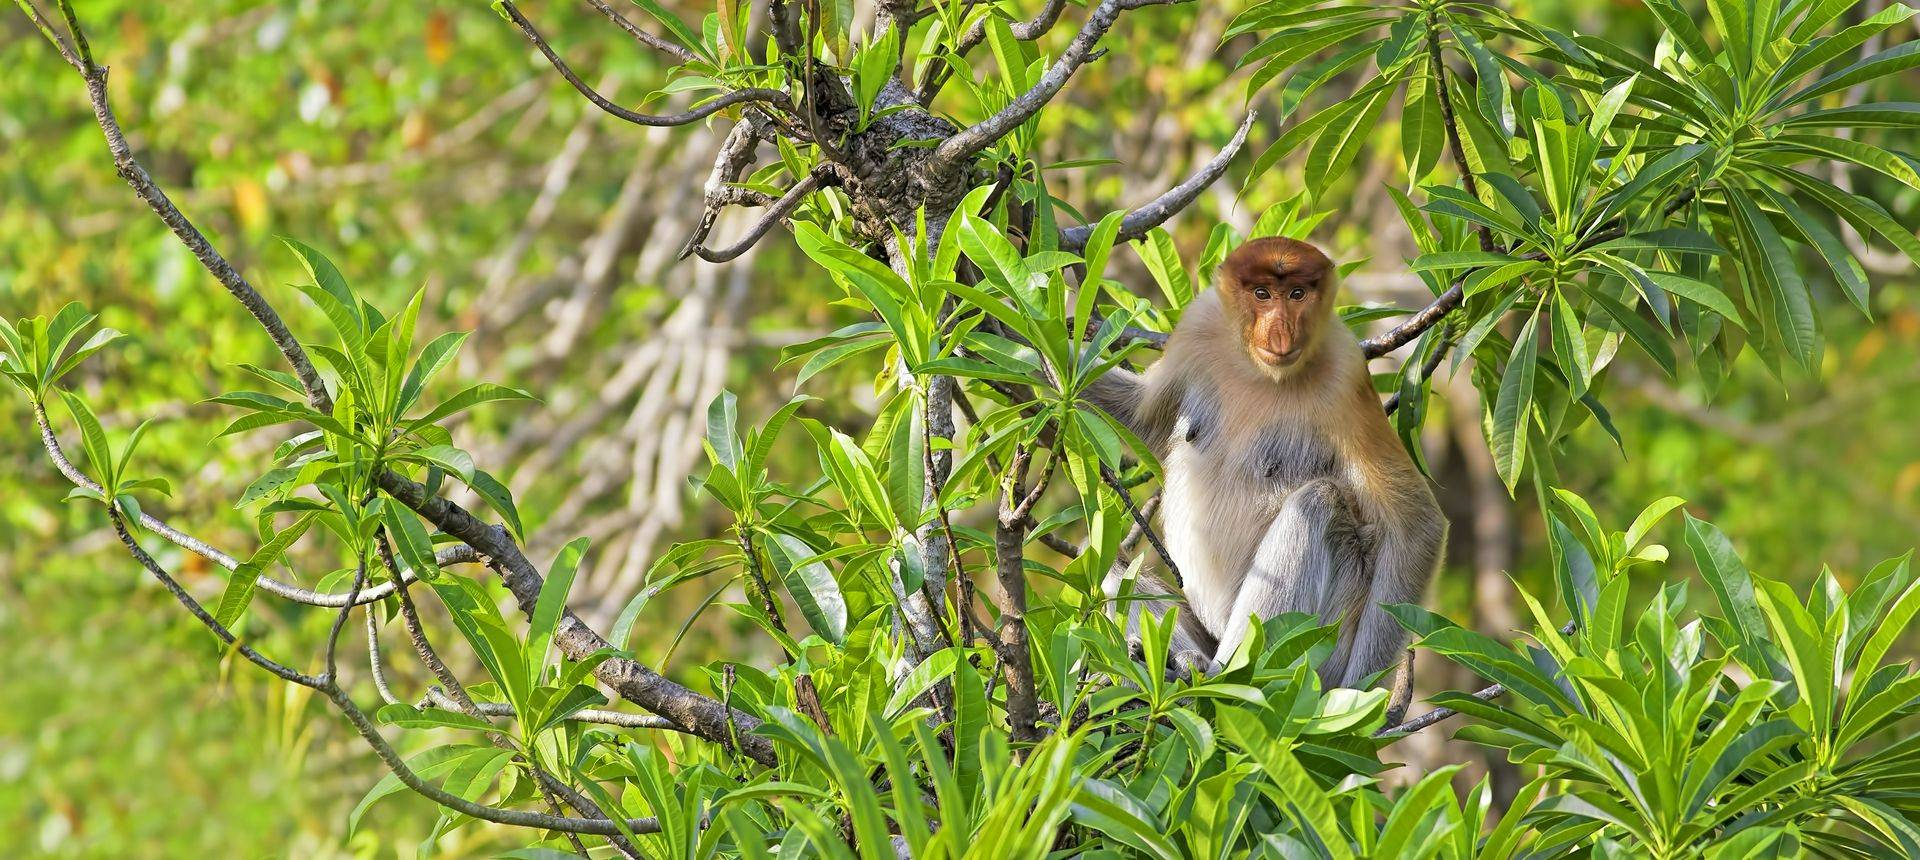 Proboscis Monkey Borneo  Shutterstock 157599356